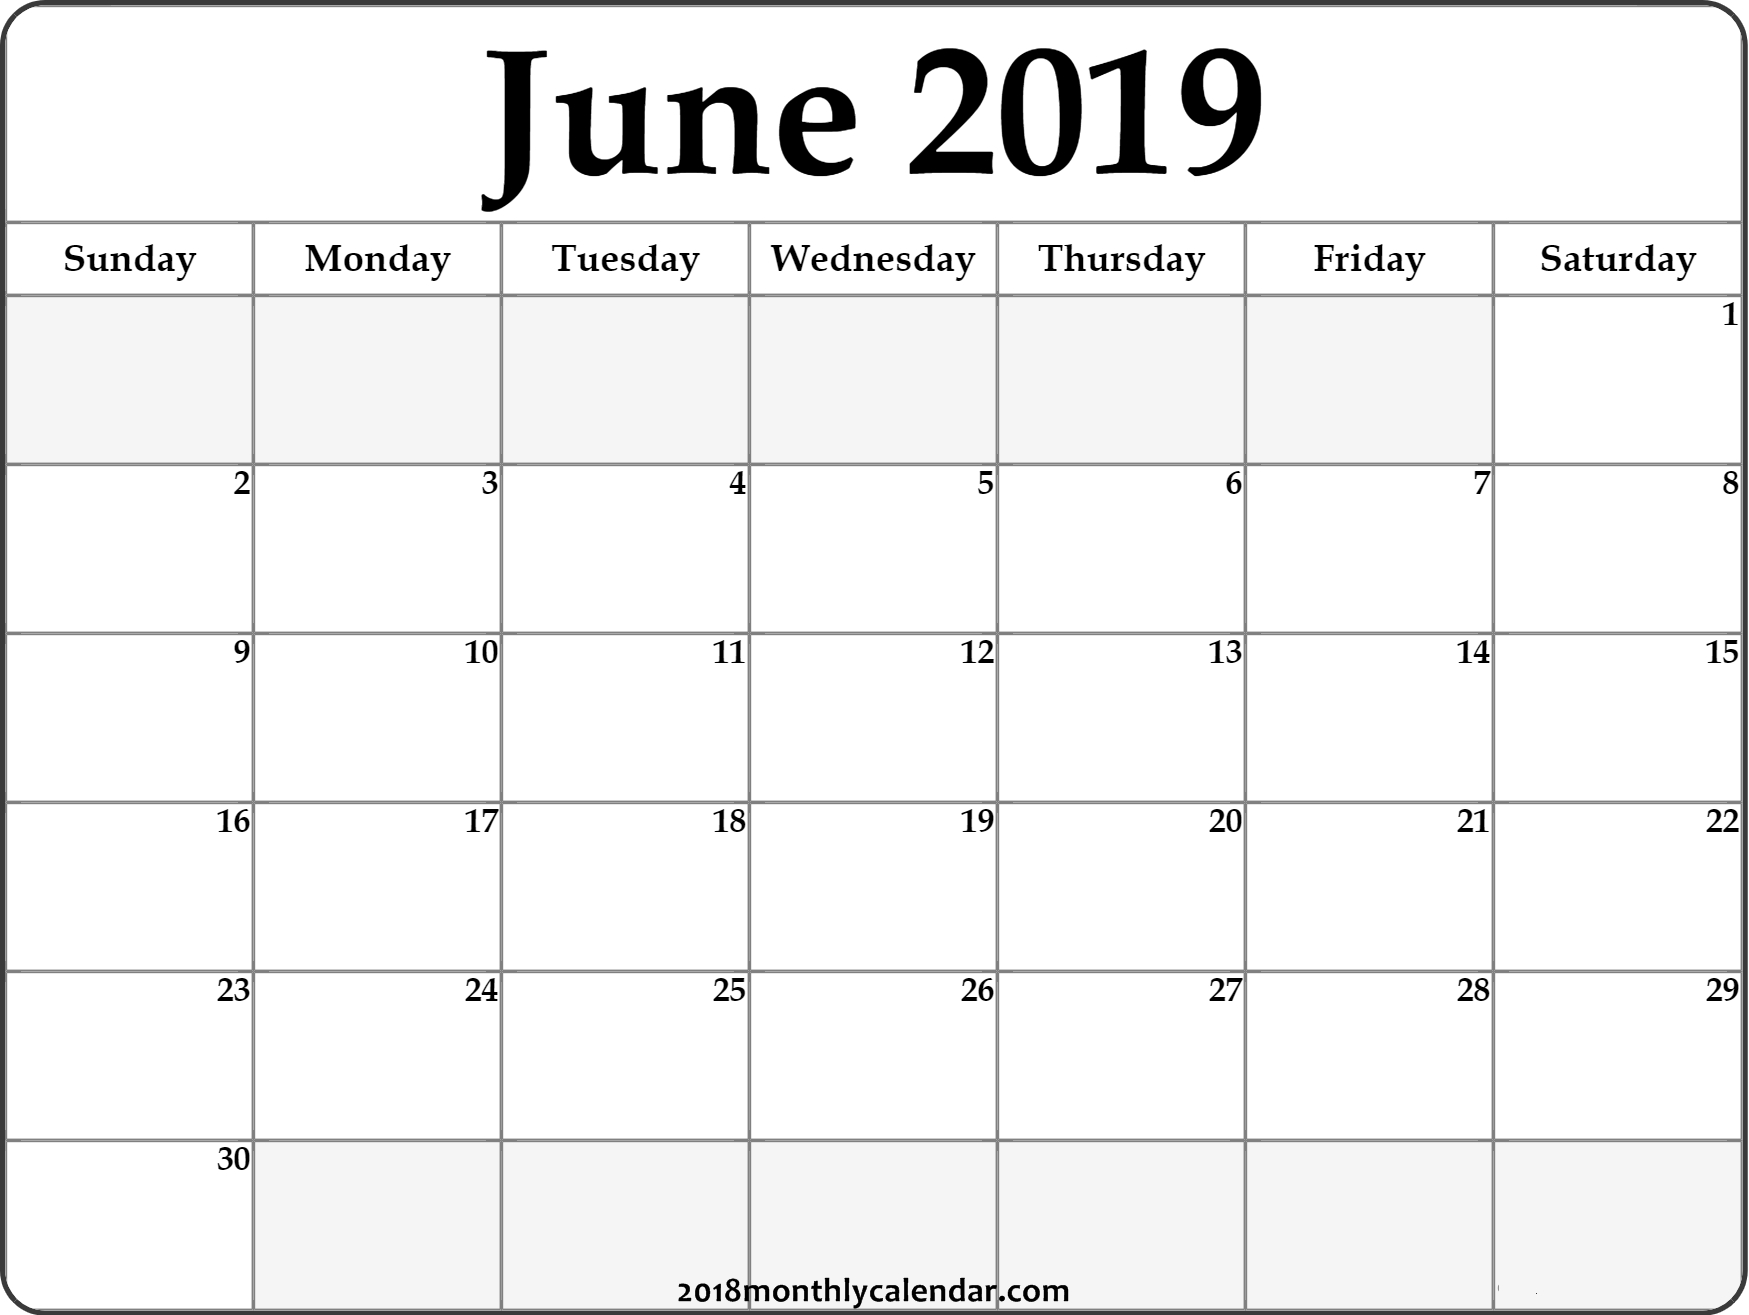 Download June 2019 Printable Calendar – Printable Blank & Editable Calendar 2019 June